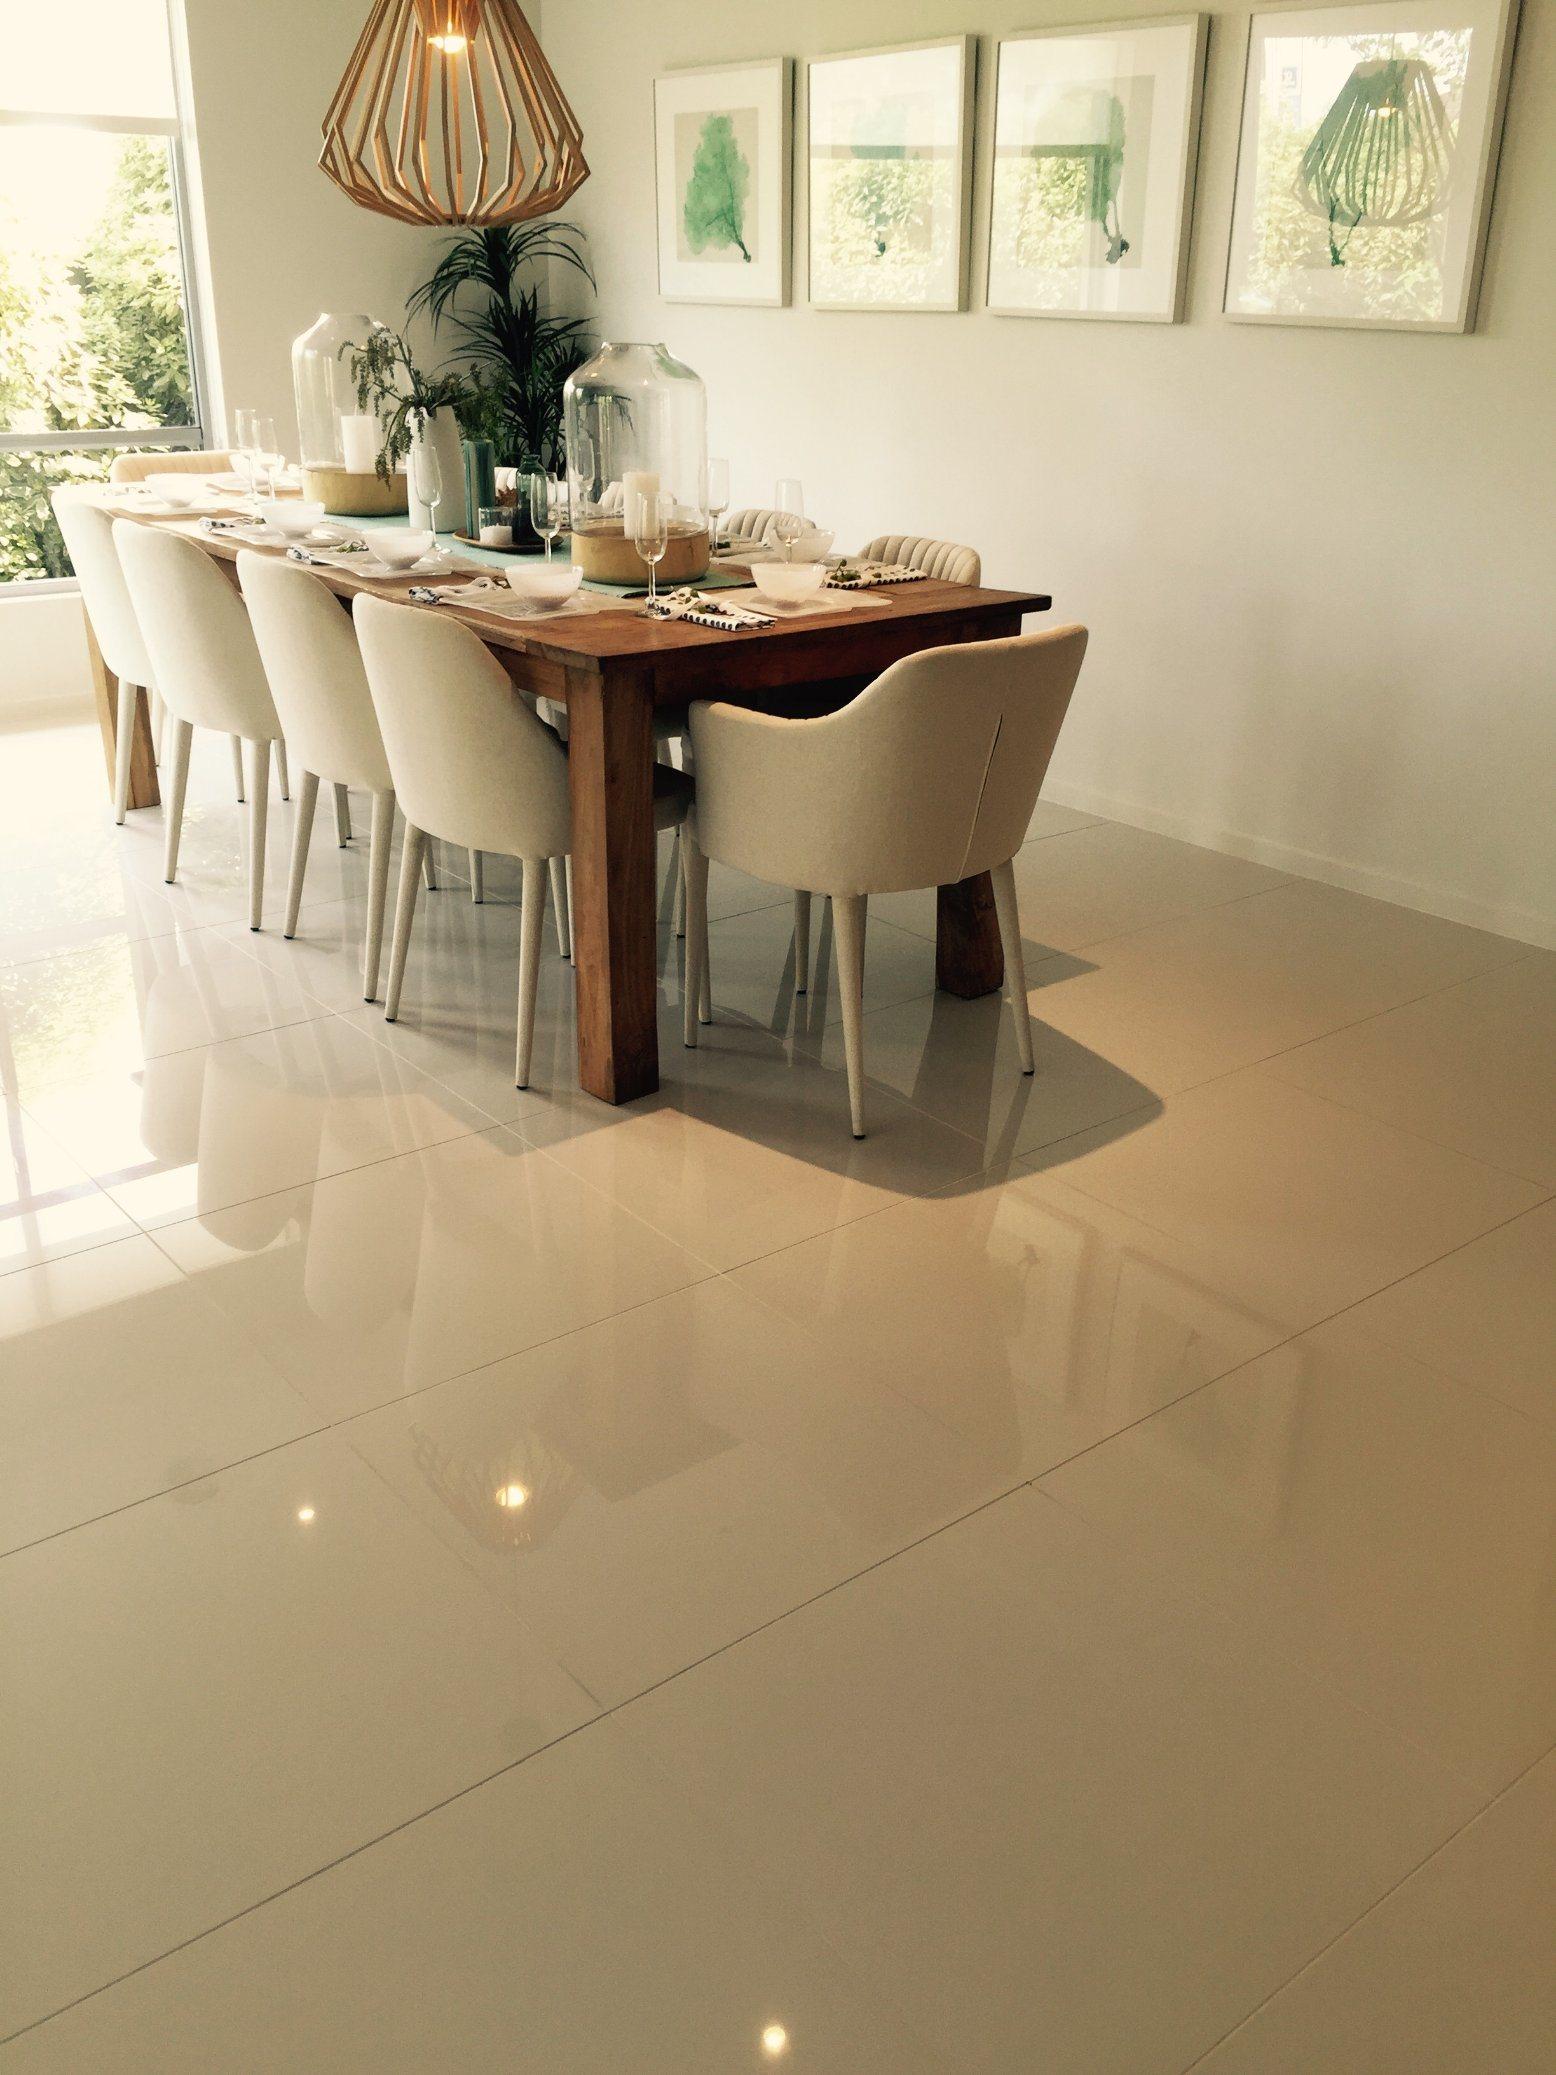 hot item brown 24 24inch 600 600mm wall brick stone tile floor tile porcelain tiles